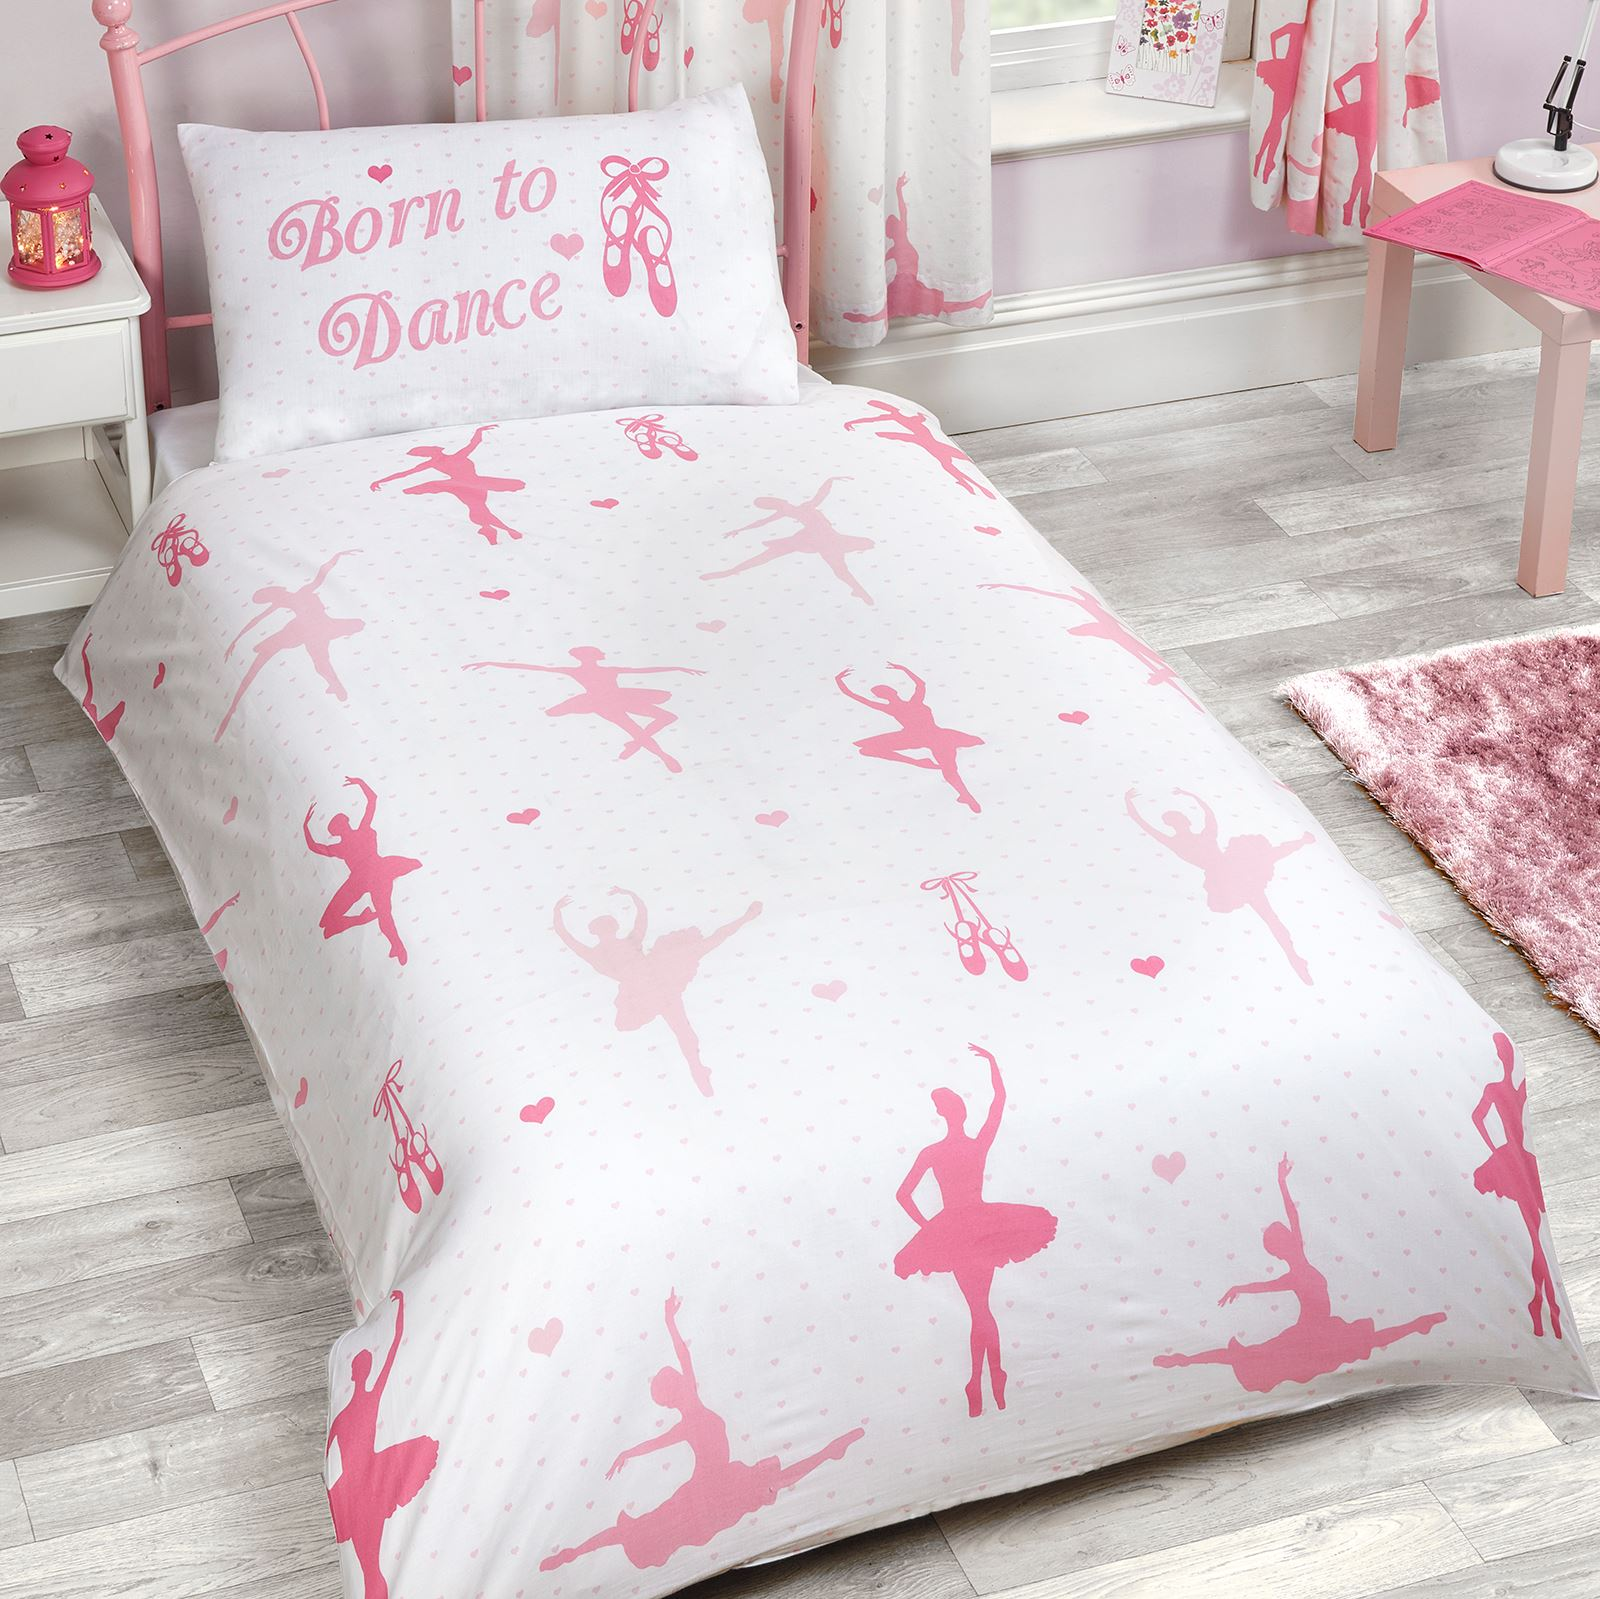 bed double linnlive birds covers bedding duvet images girls com unicorn single junior itm ballerina